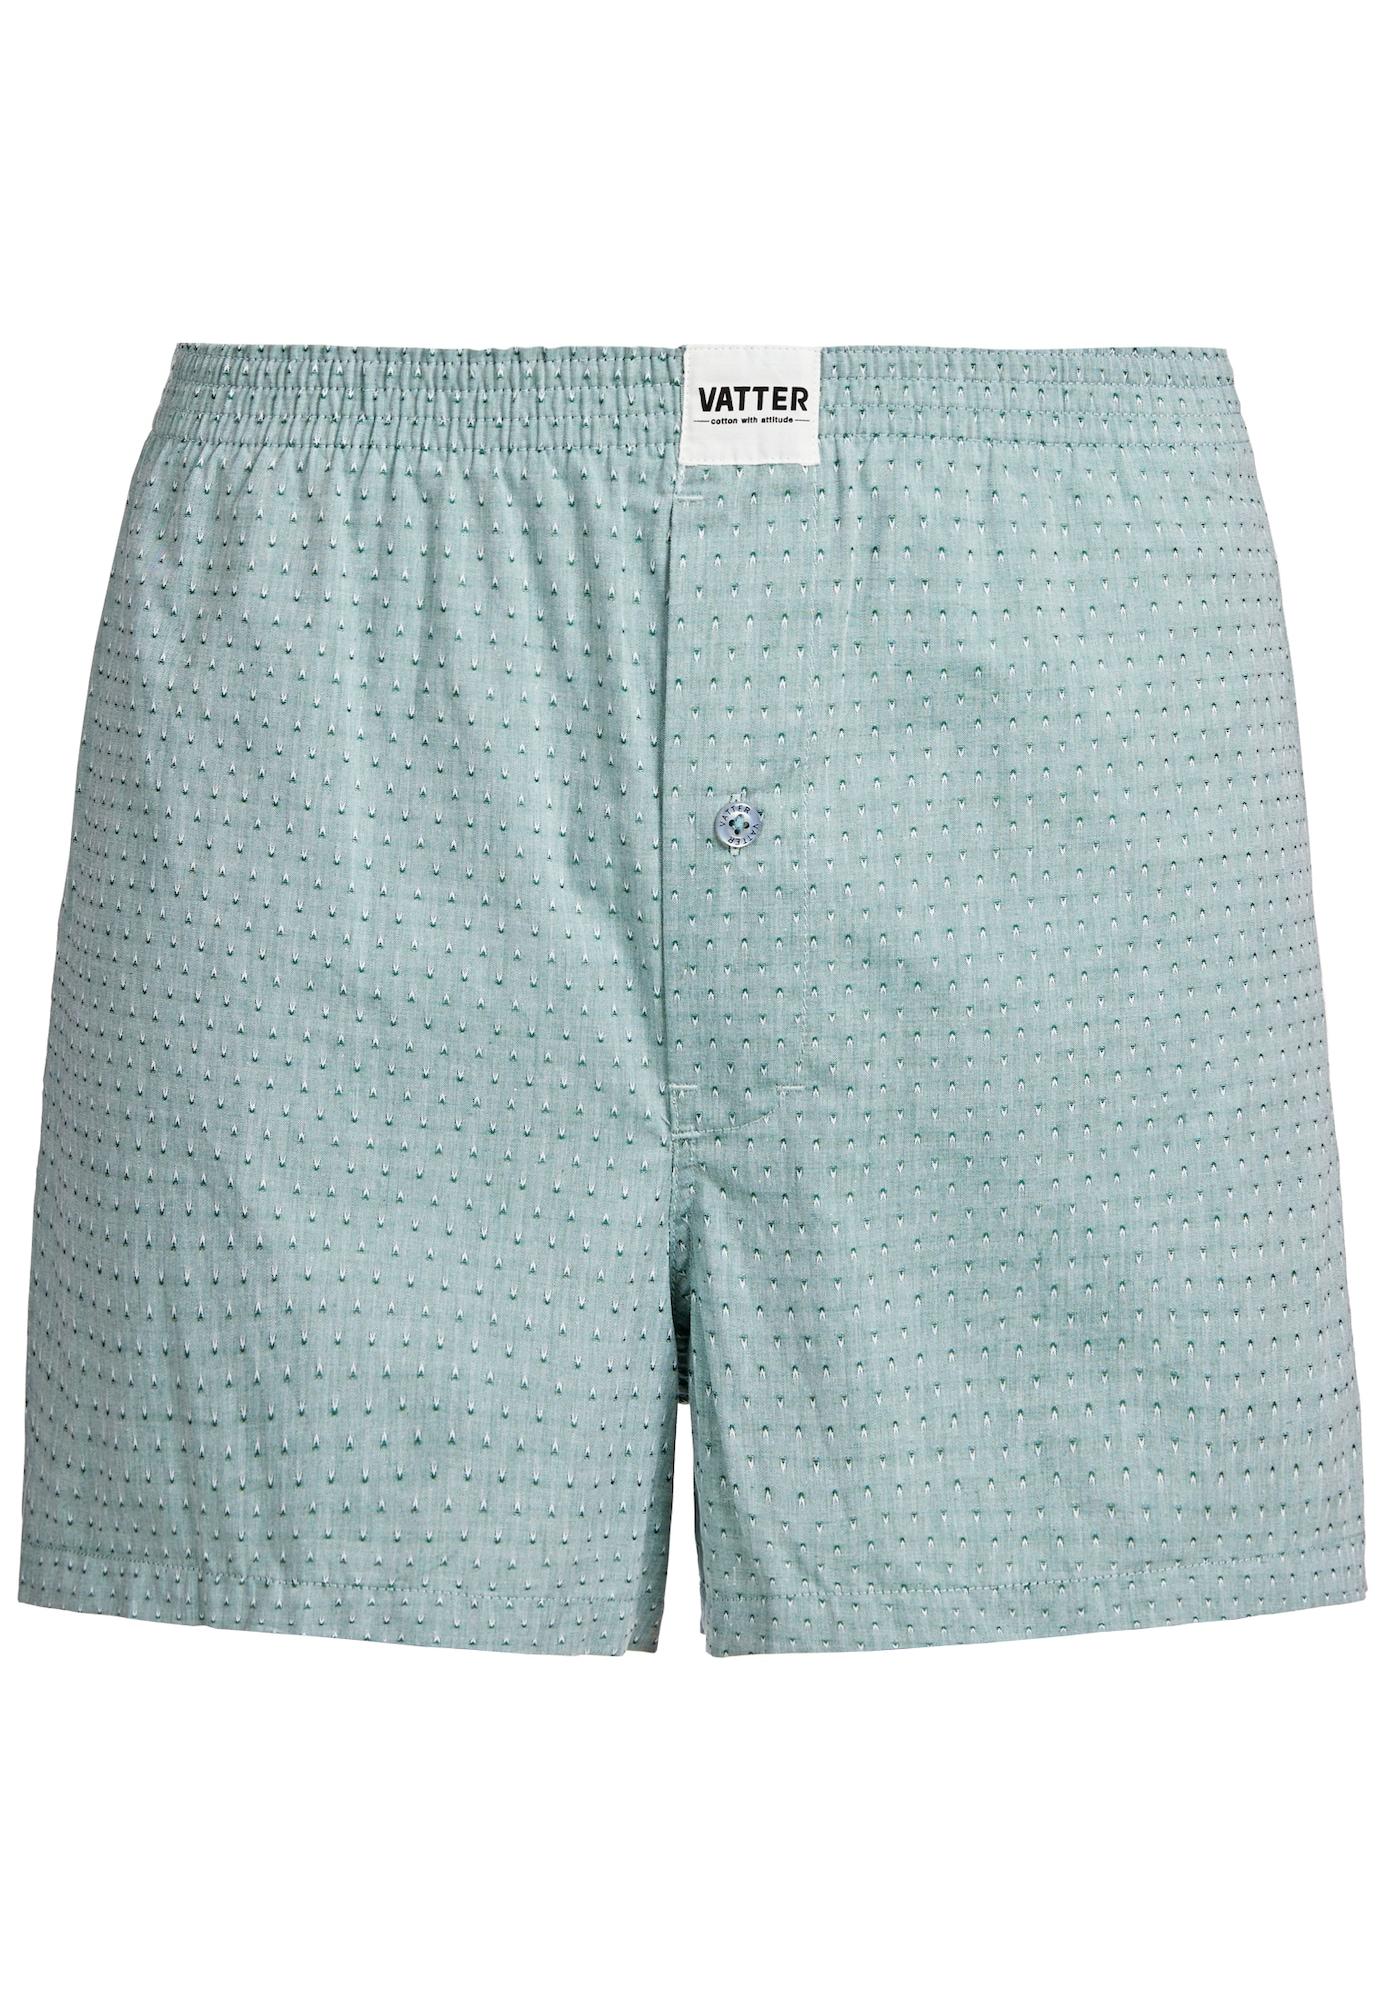 'Loose Larry' Boxer Short | Bekleidung > Wäsche > Boxershorts | Grün - Hellgrün | VATTER